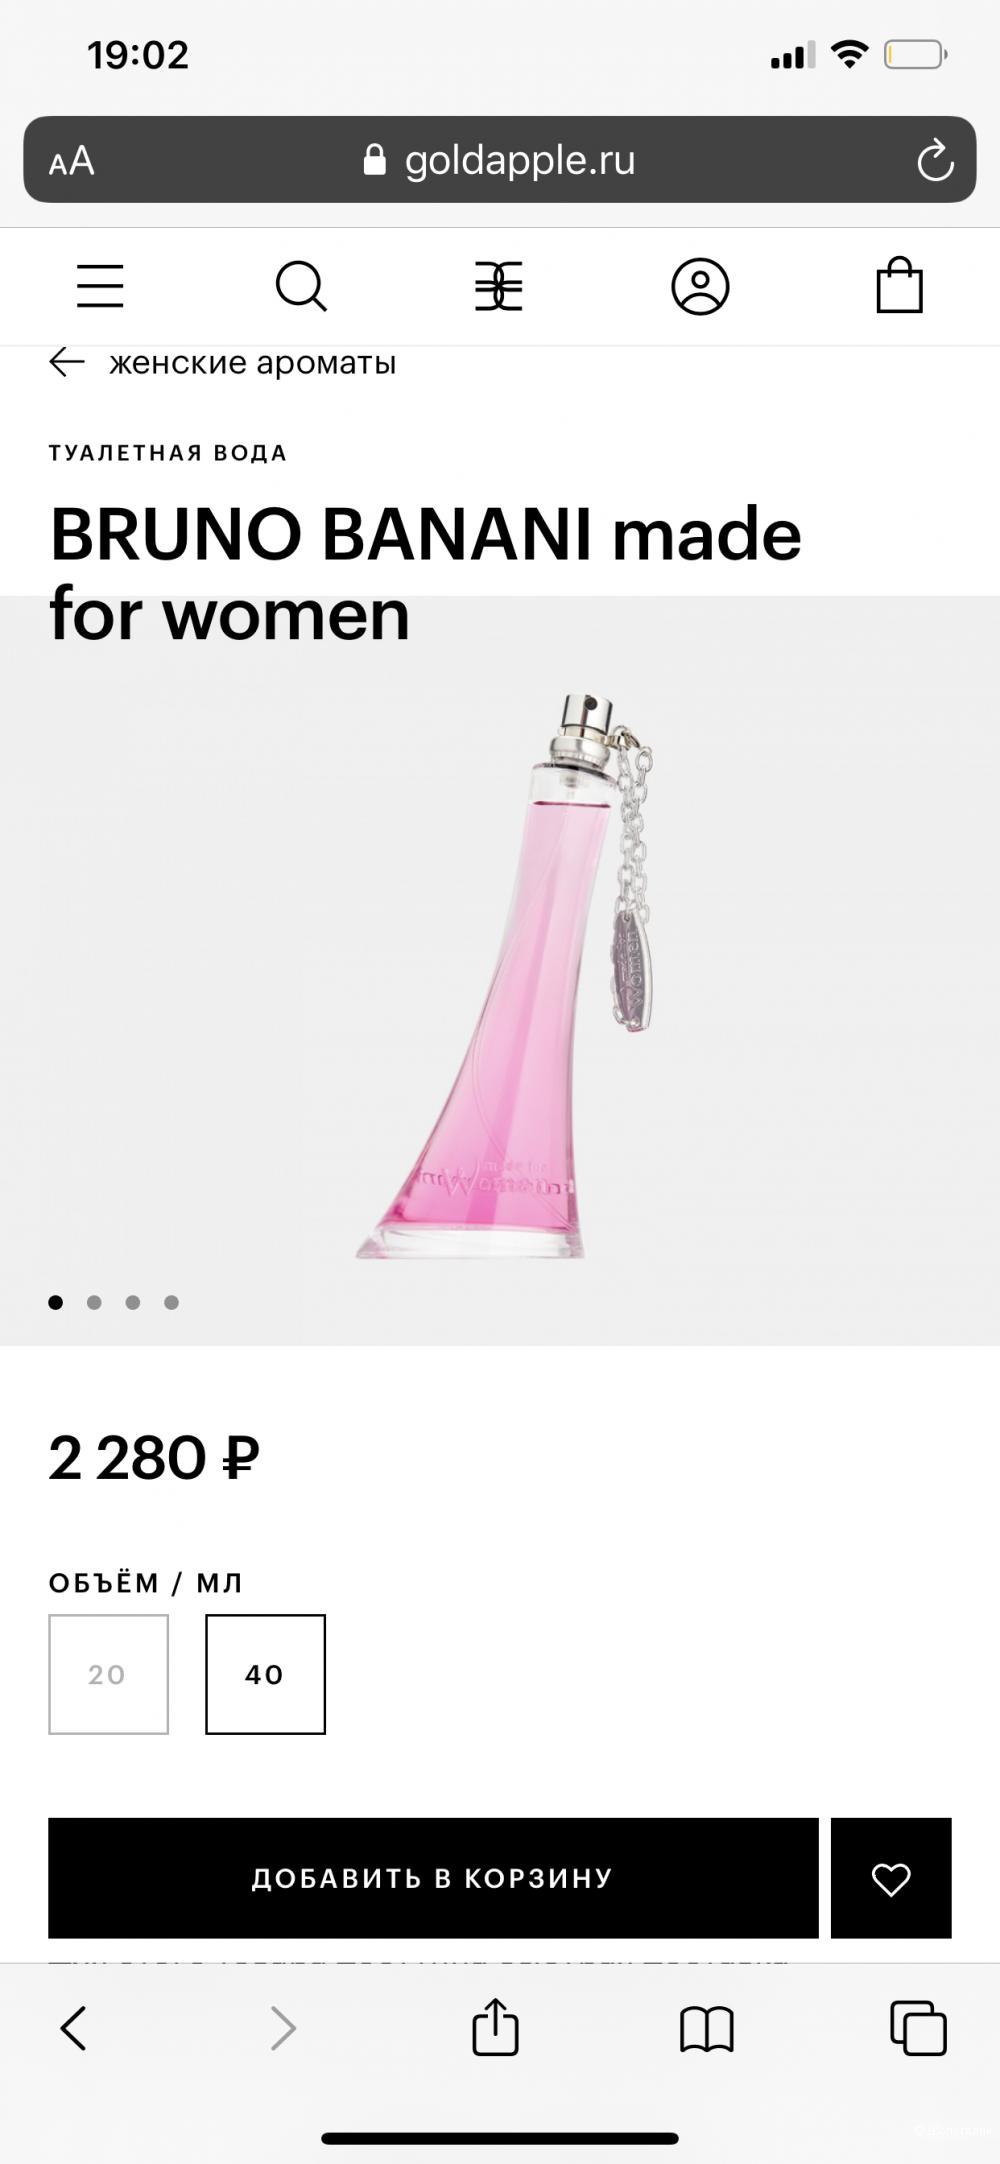 Туалетная вода BRUNO BANANI made for women, 40 ml